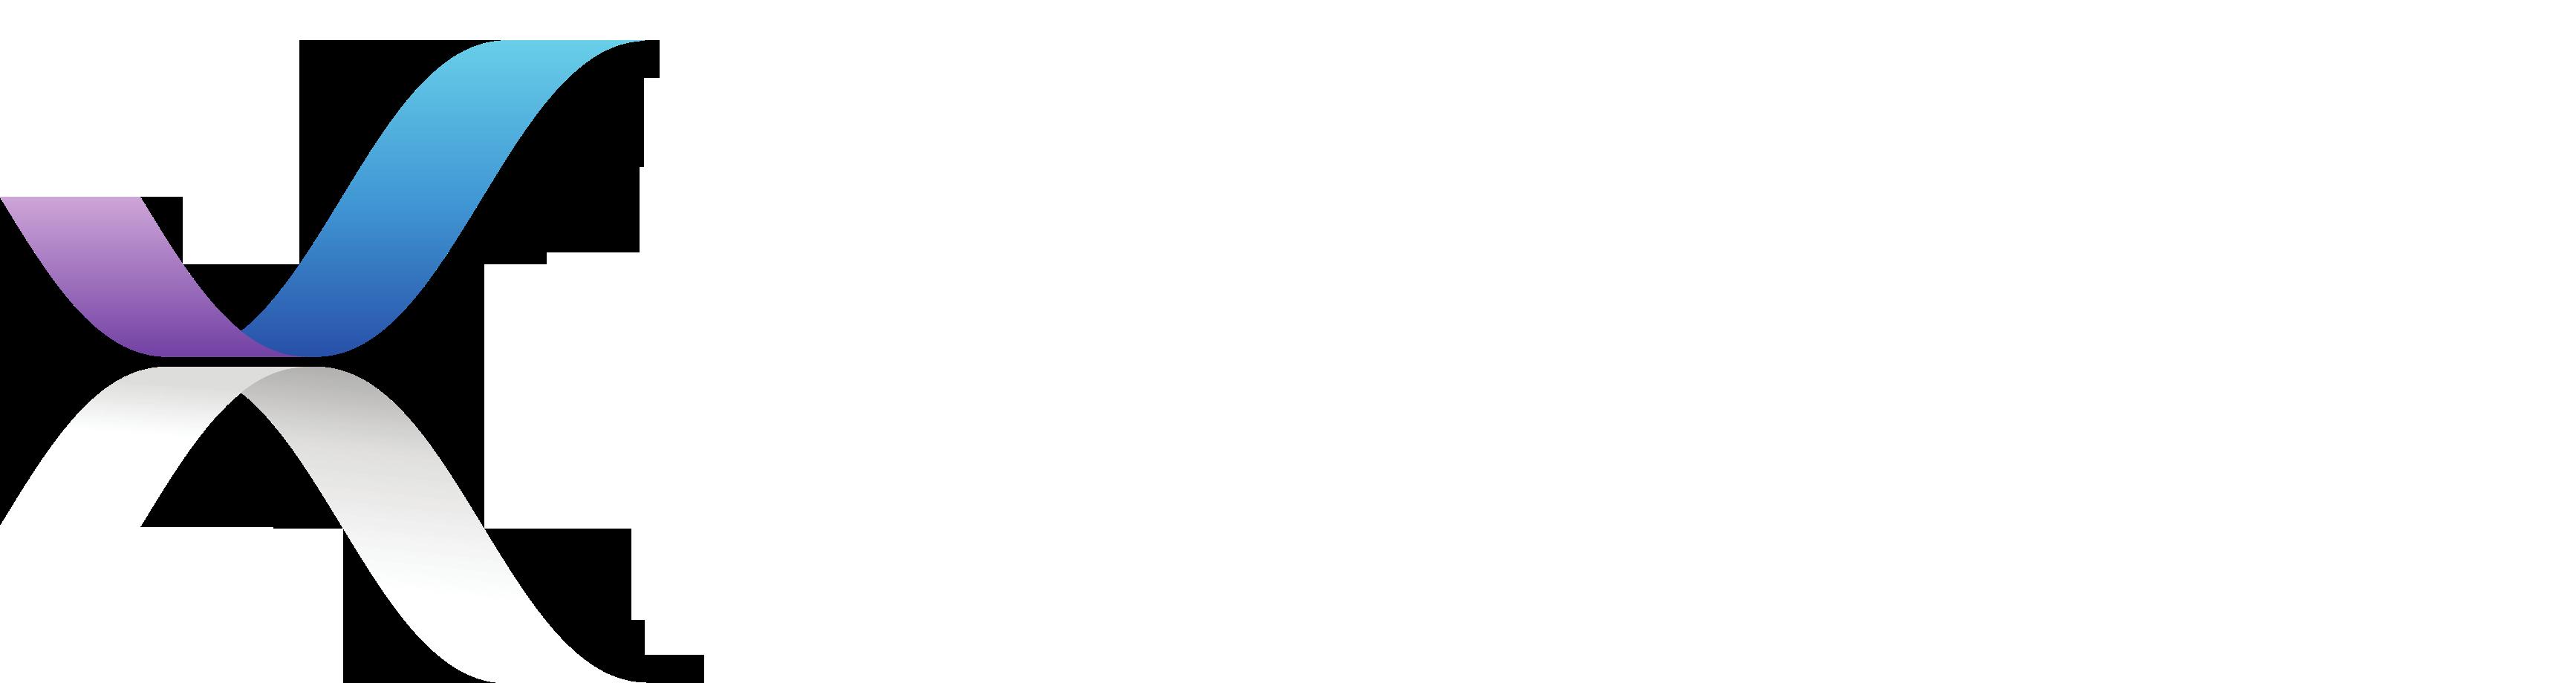 Usce_logo2a